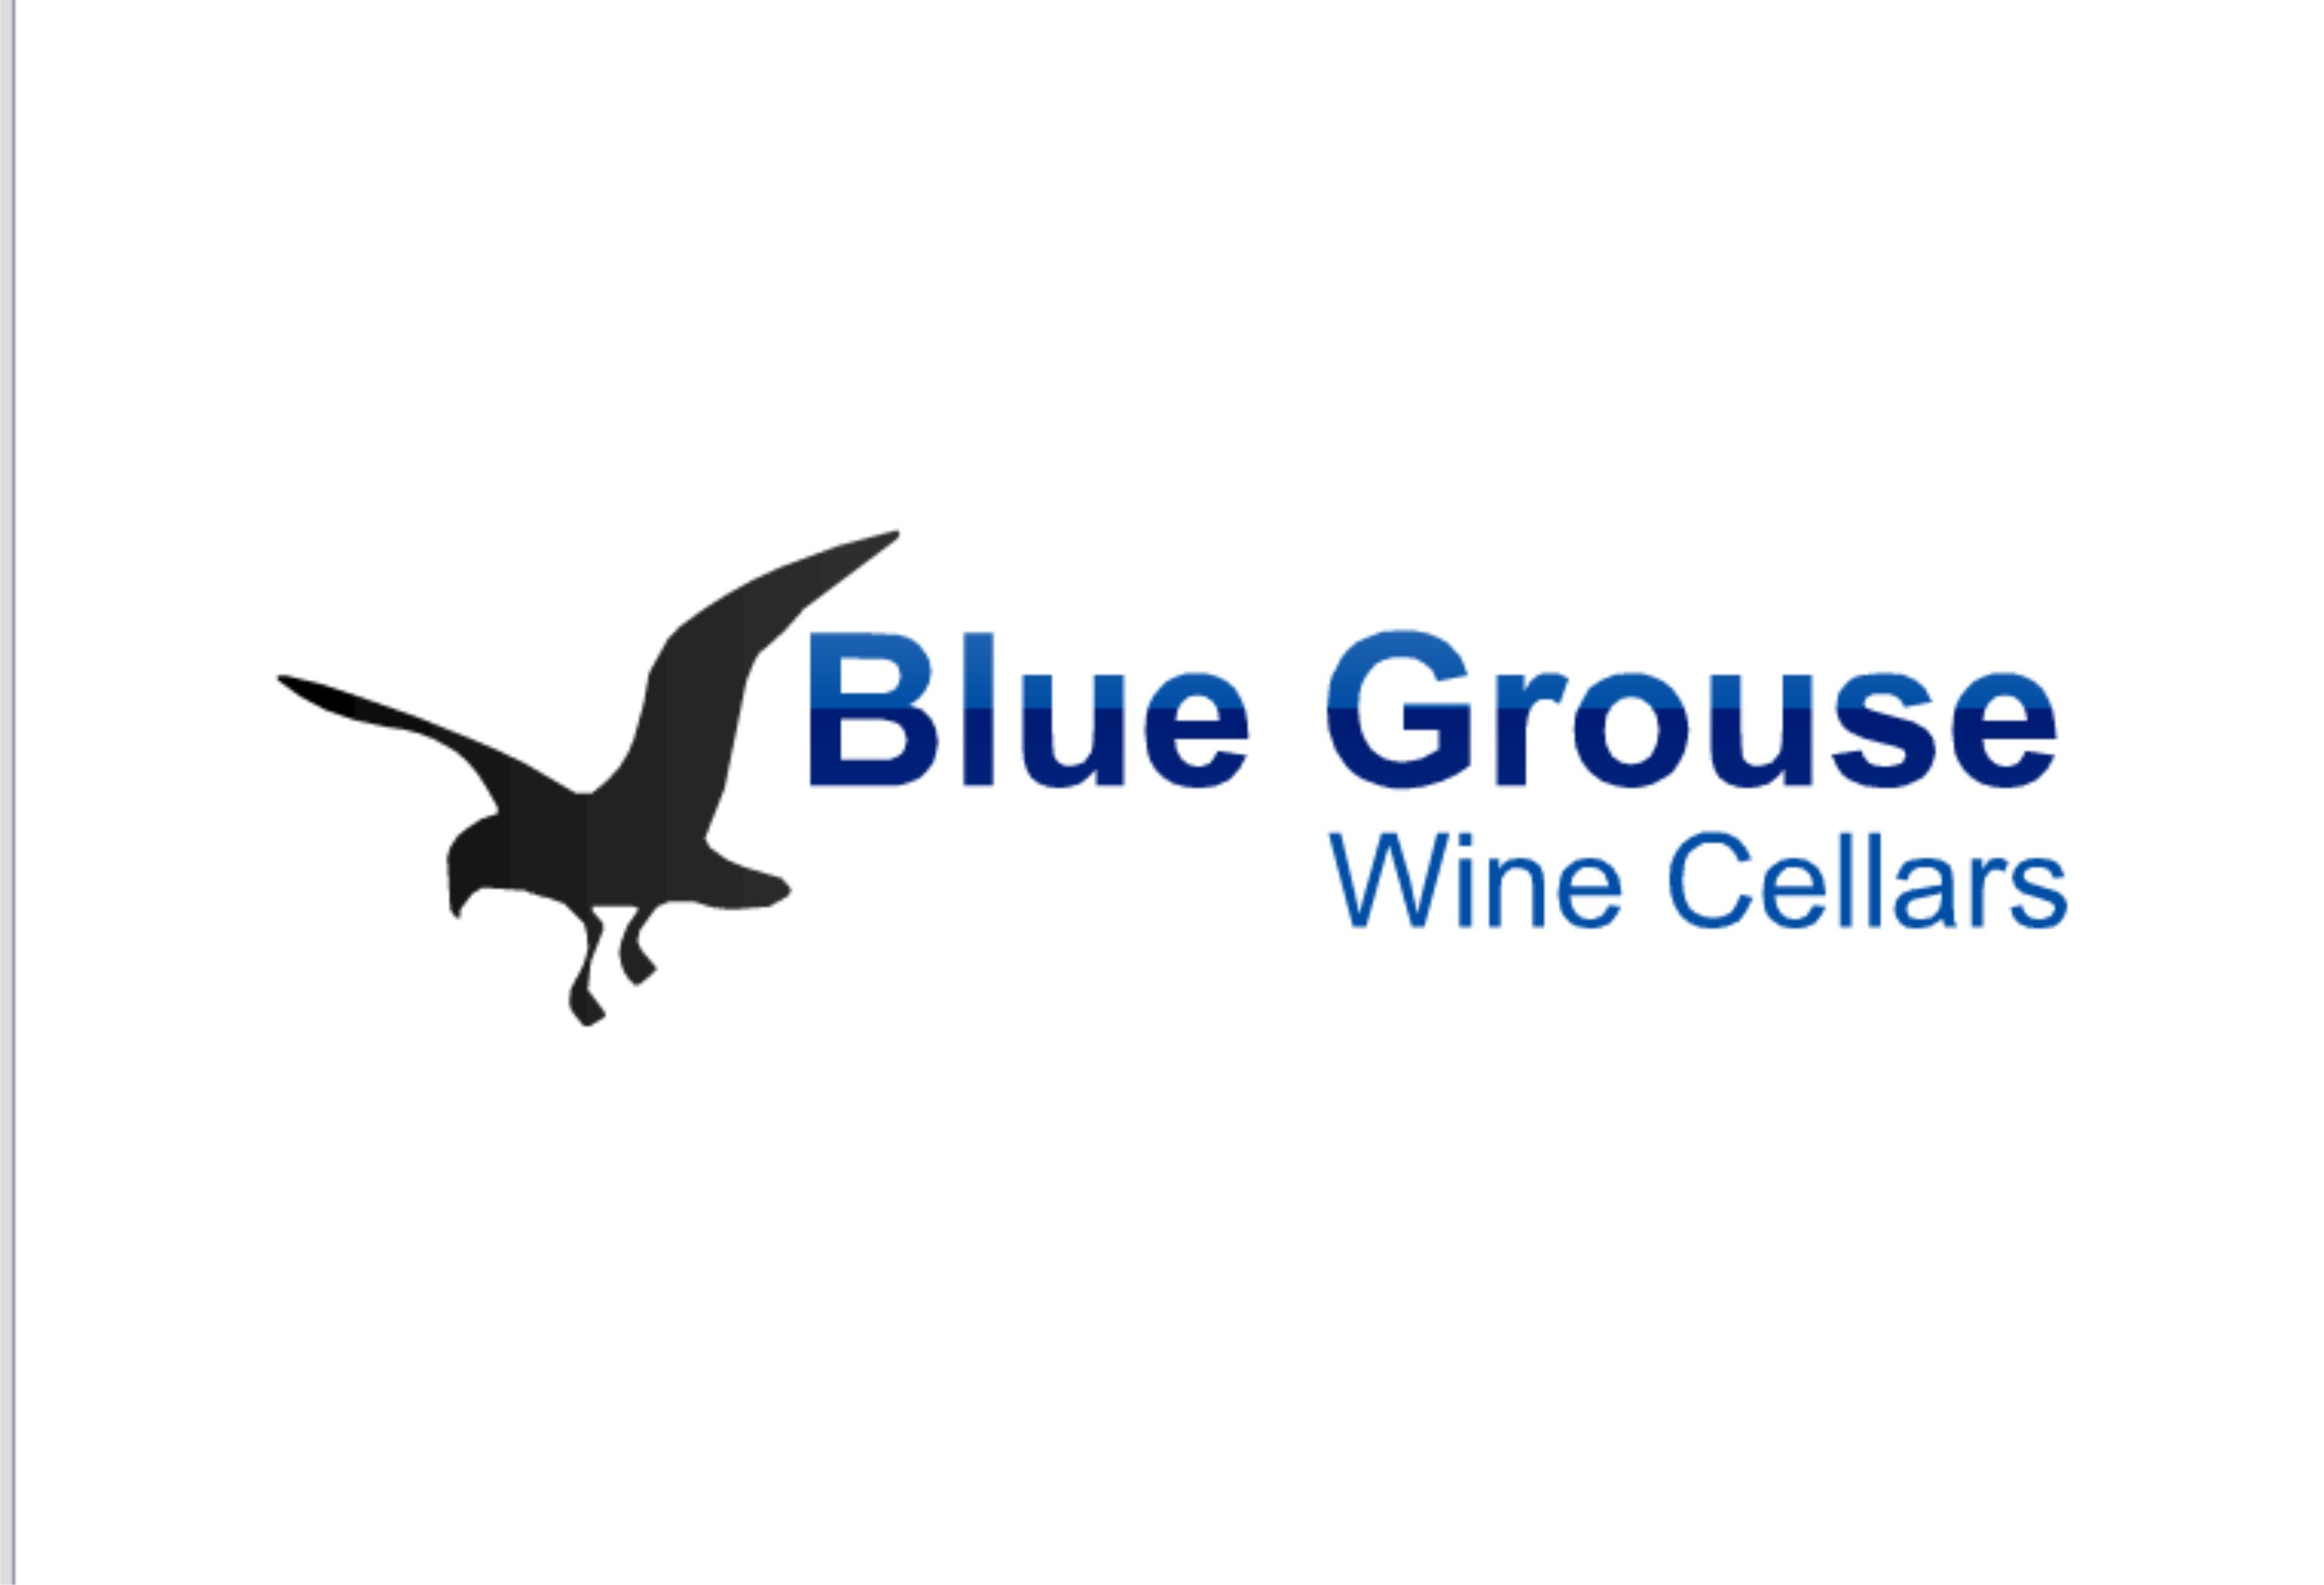 Logo Design by Shailender Kumar - Entry No. 149 in the Logo Design Contest Creative Logo Design for Blue Grouse Wine Cellars.